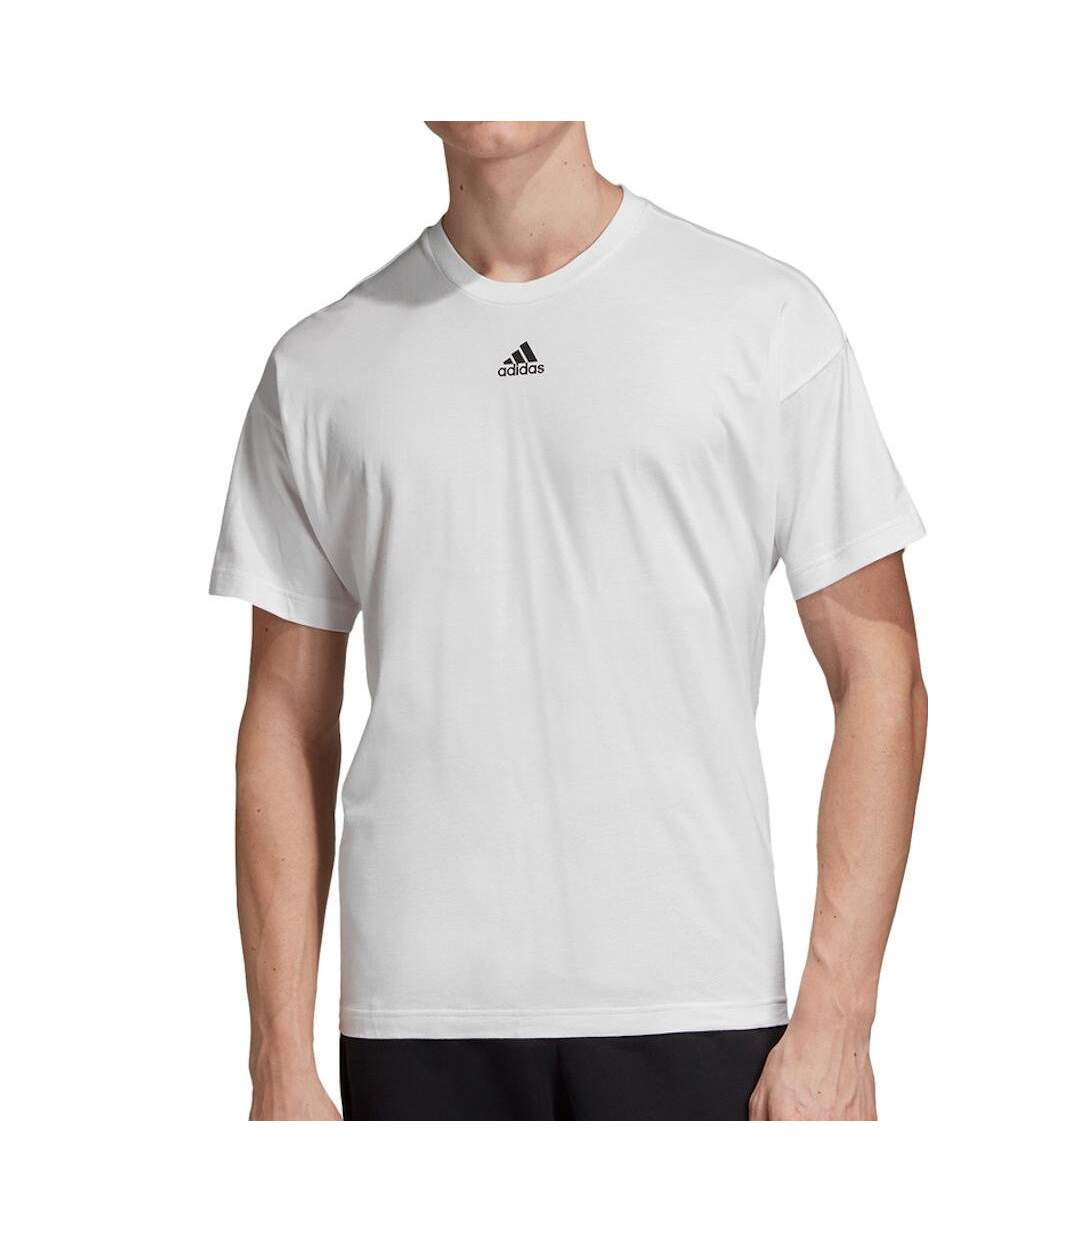 T-shirt Blanc Homme Adidas 3 stripes